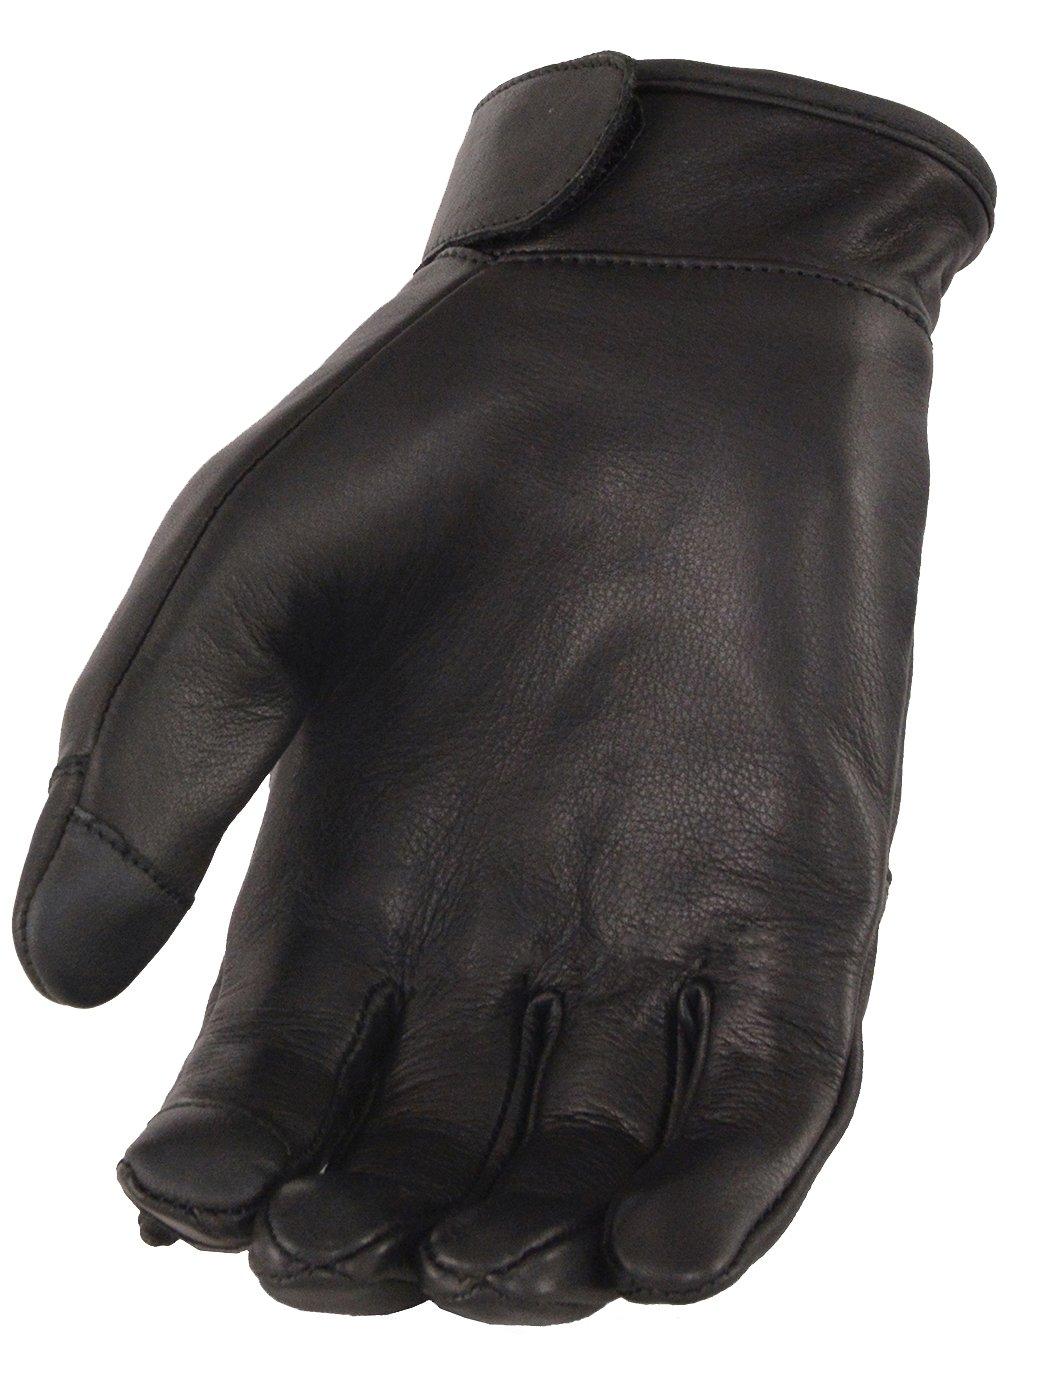 Men's Premium Leather Gloves w// Led Finger Lights w// Touch Screen Fingers MG7599